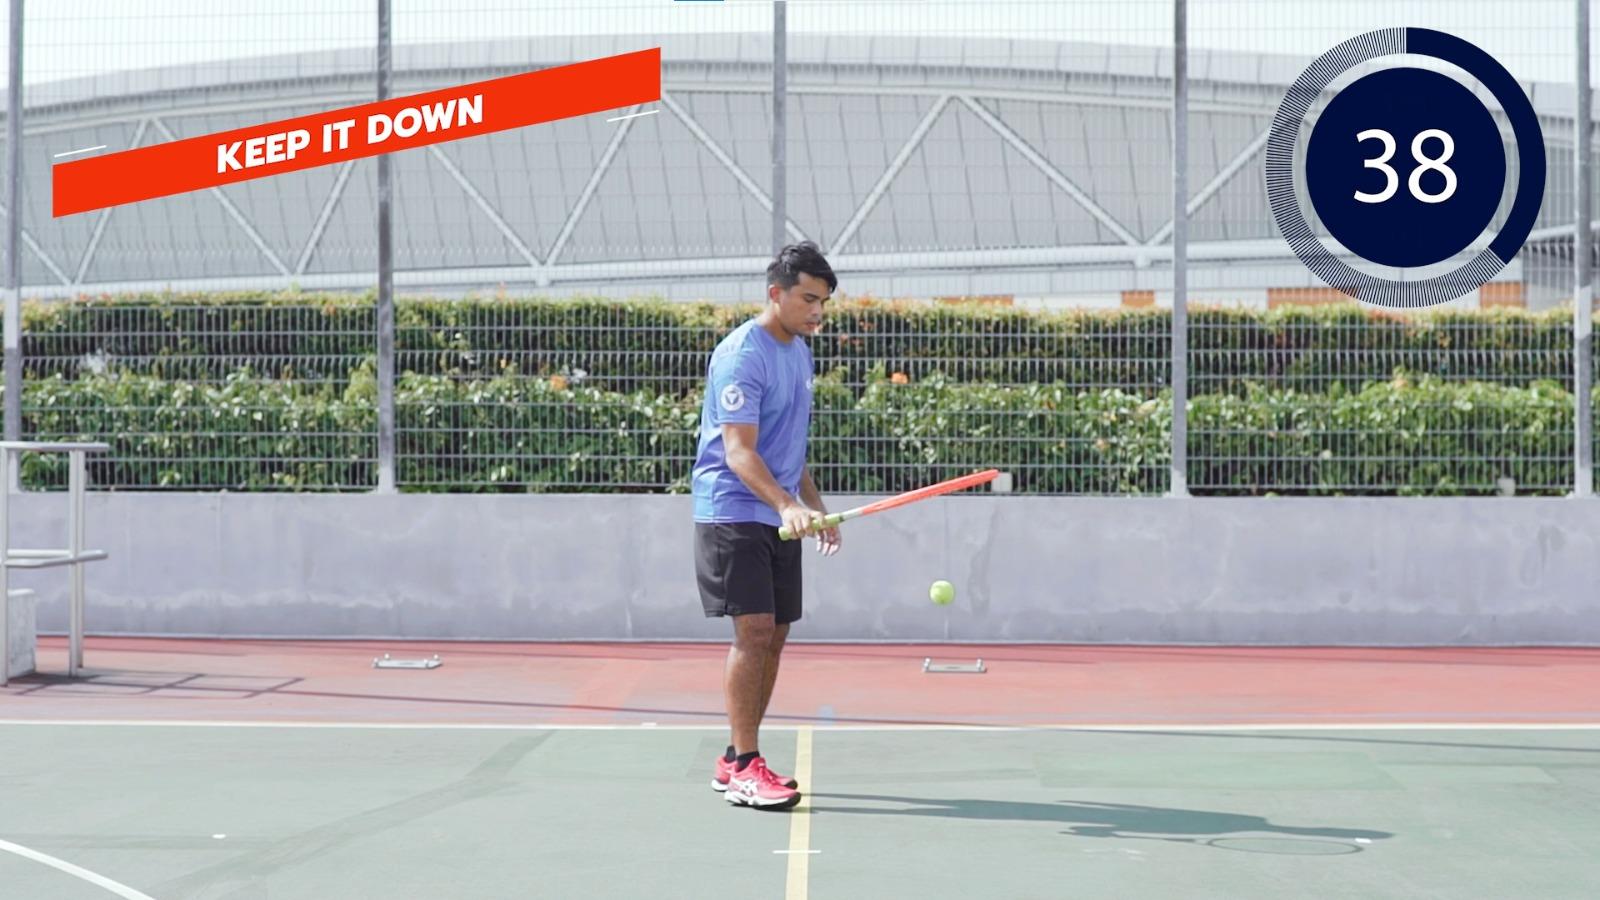 tennis keep it down